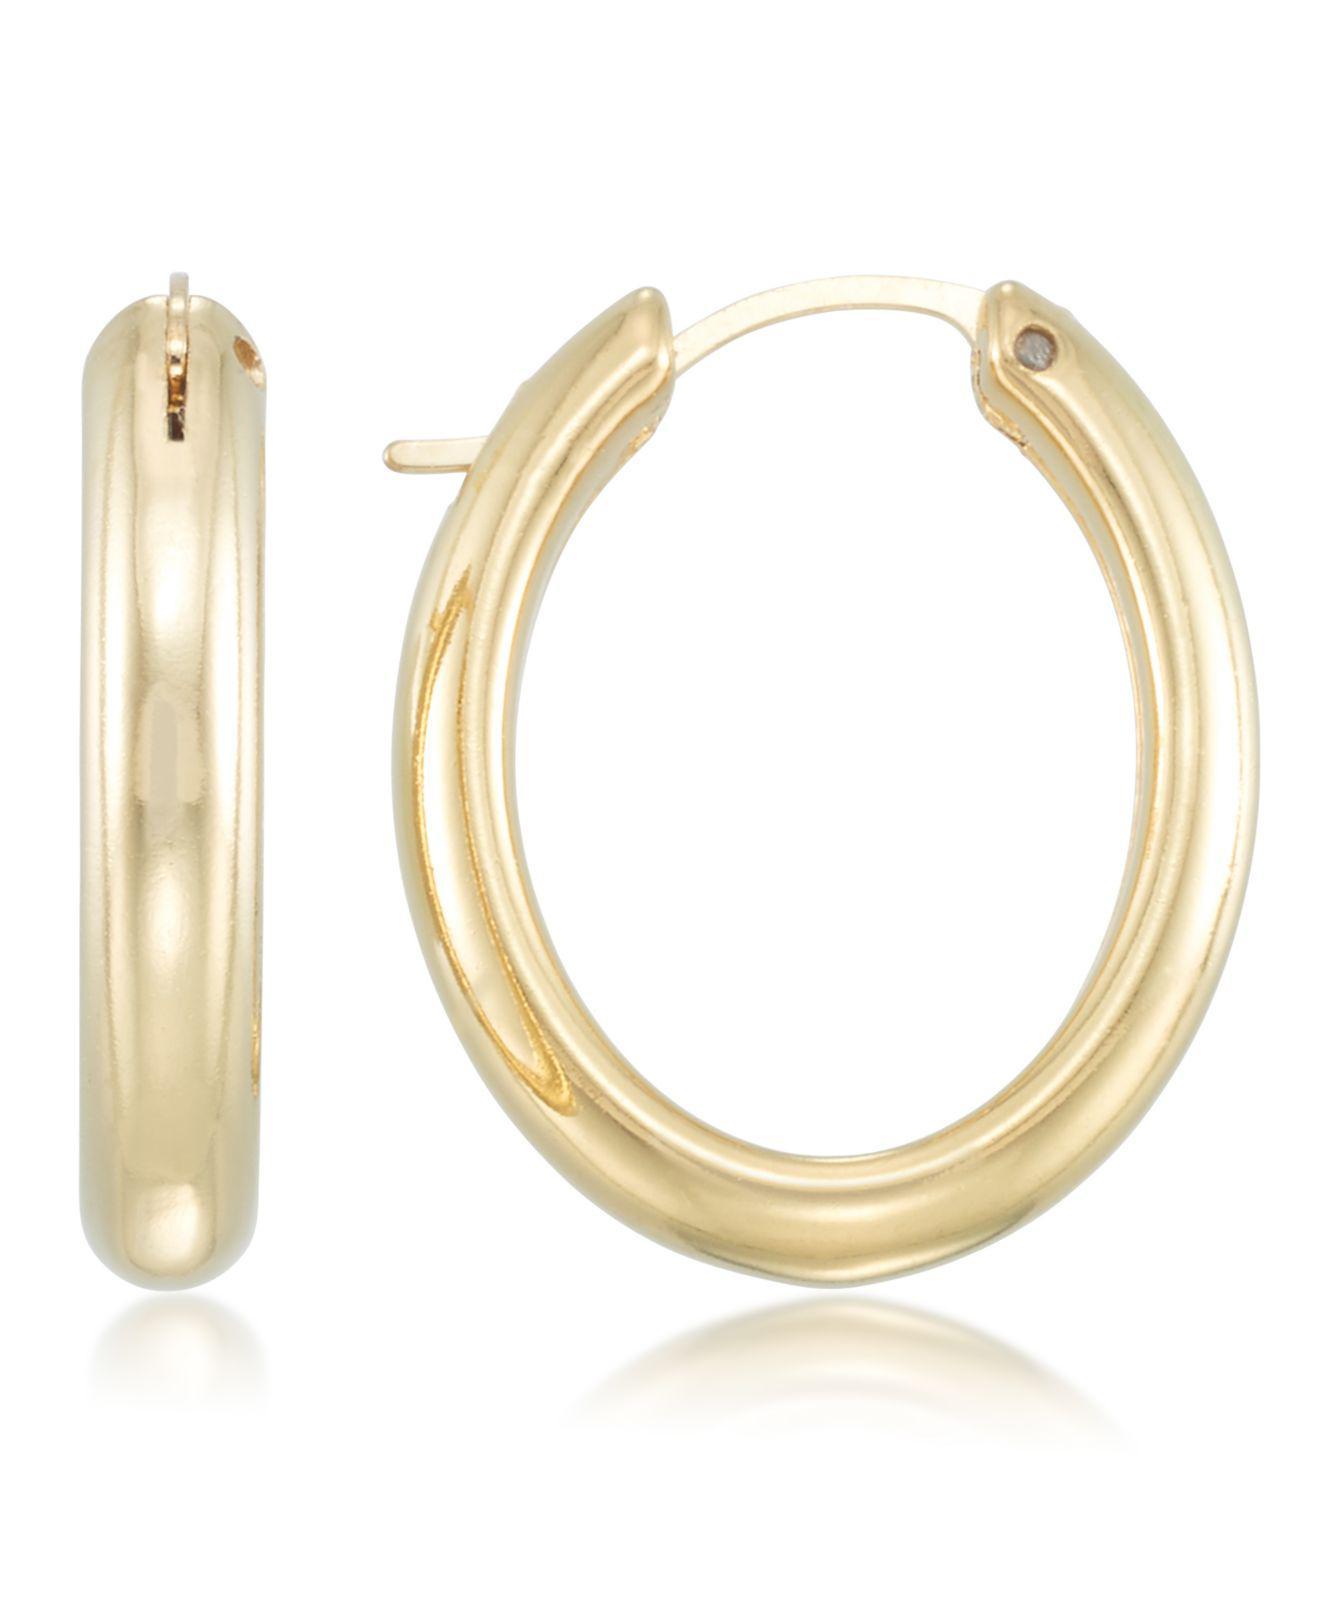 fb21422fa2bae Lyst - Signature Gold Tm Diamond Accent Polished Oval Hoop Earrings ...